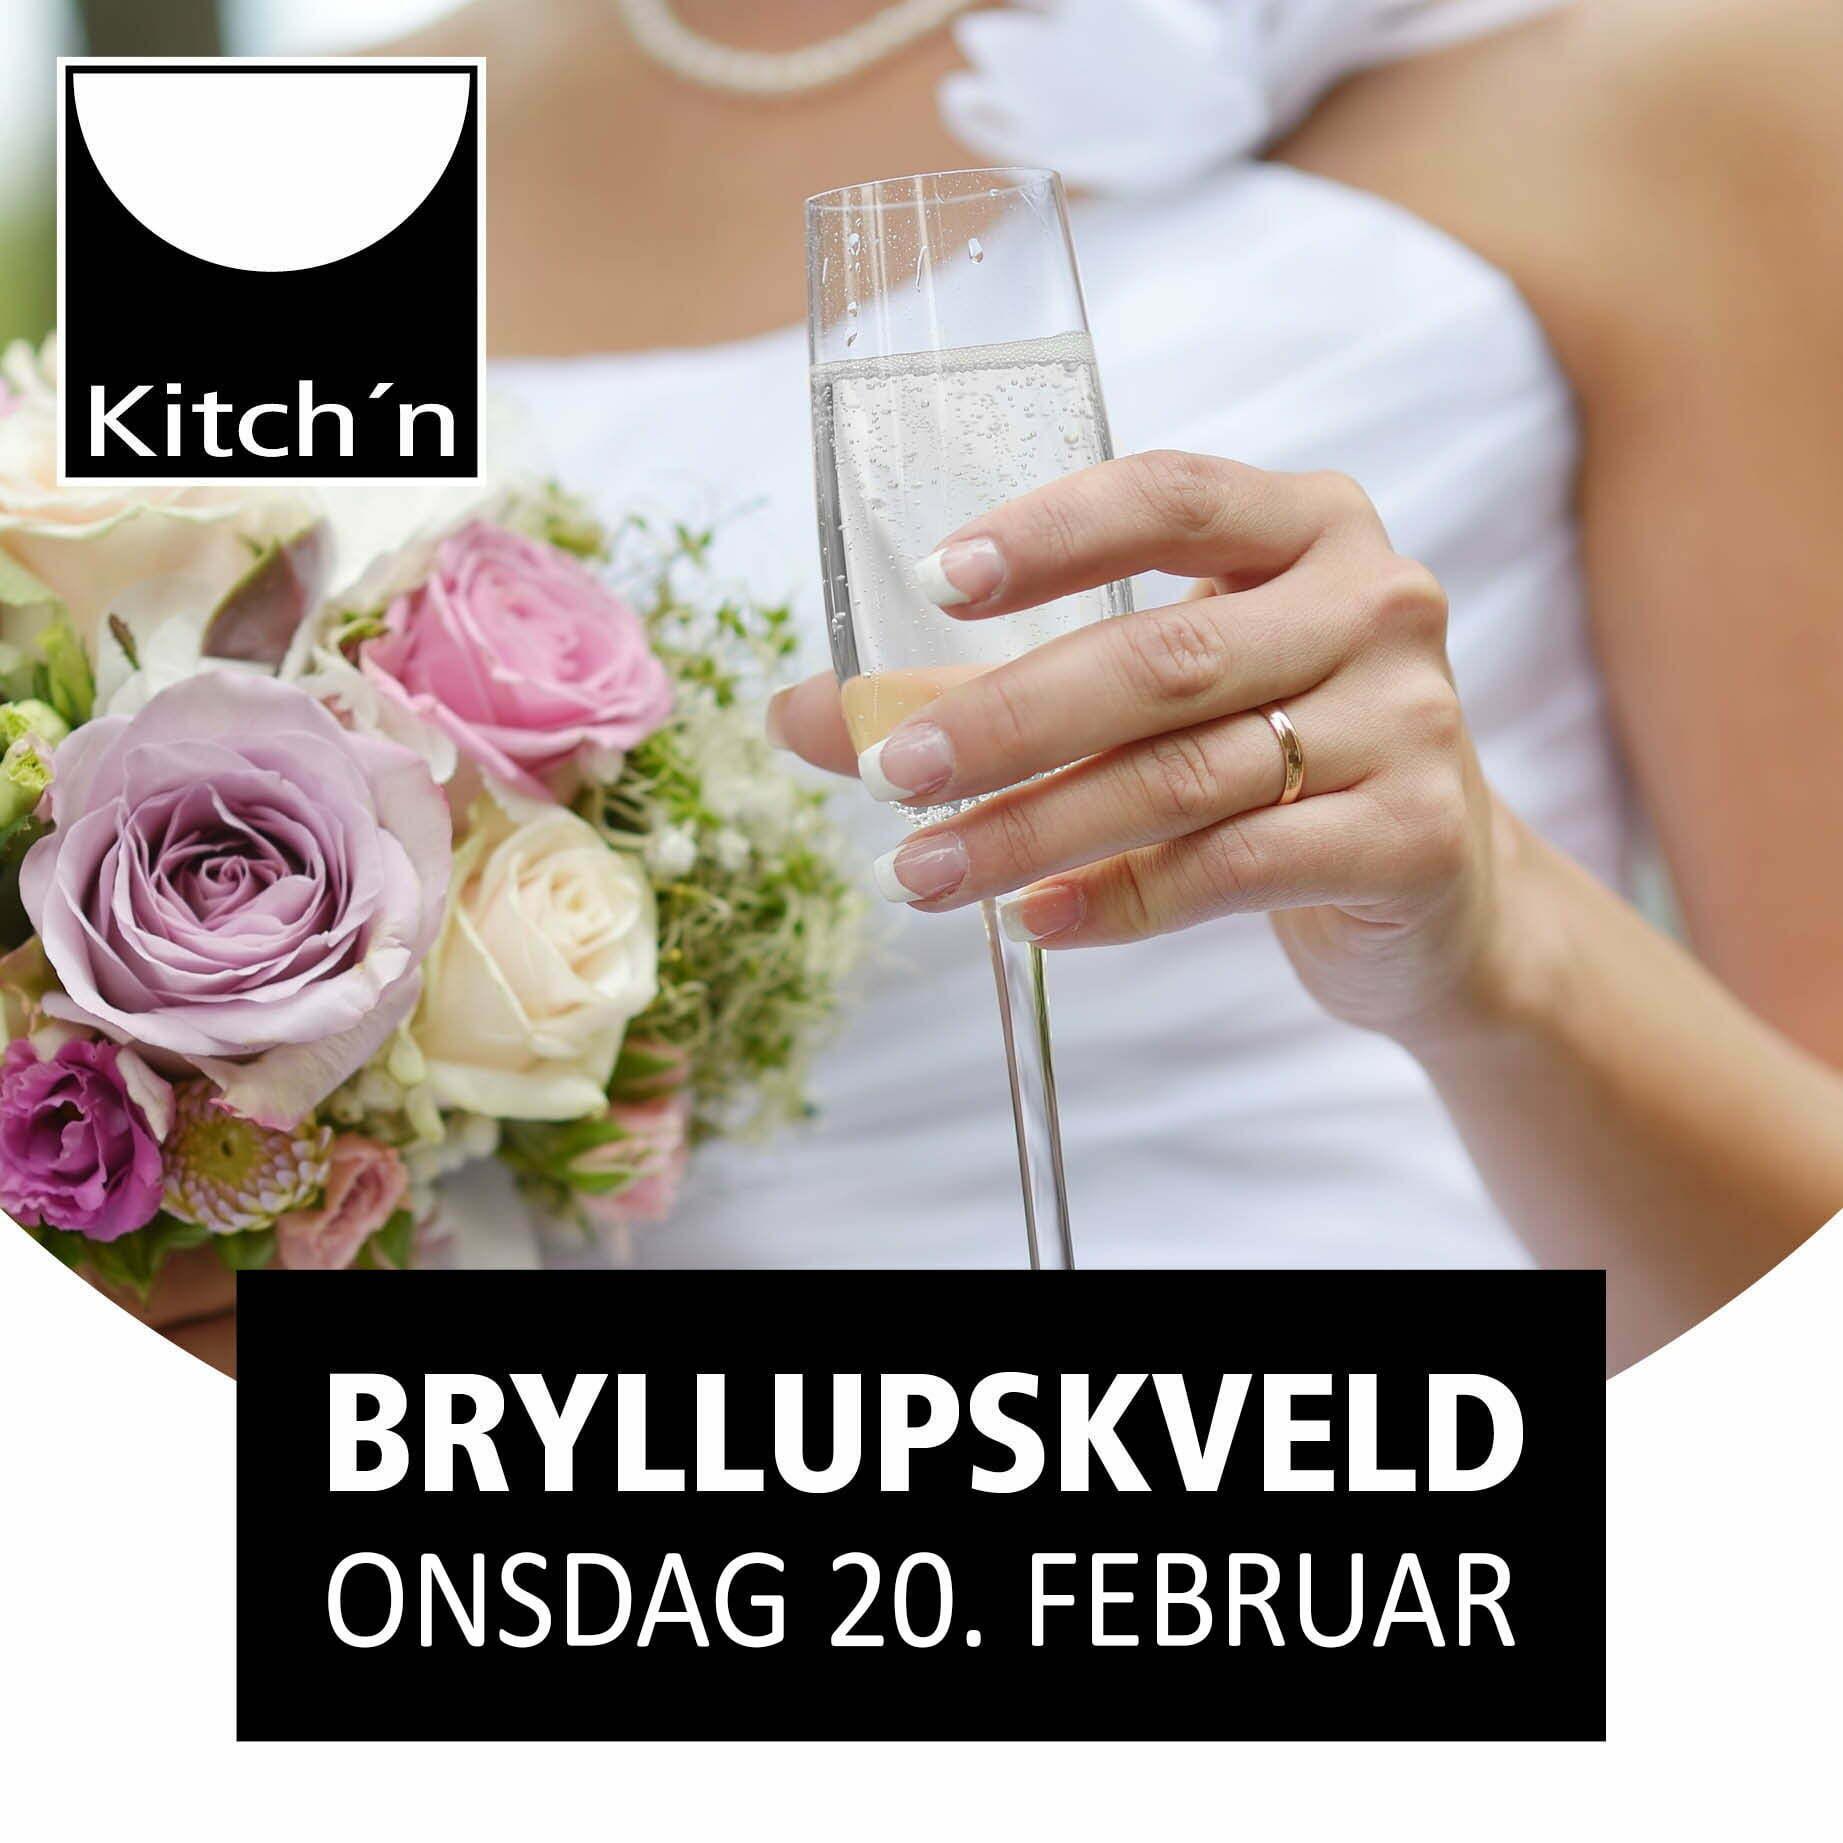 Bryllupskveld bryllupsmesse kitchn gaver til bryllupet